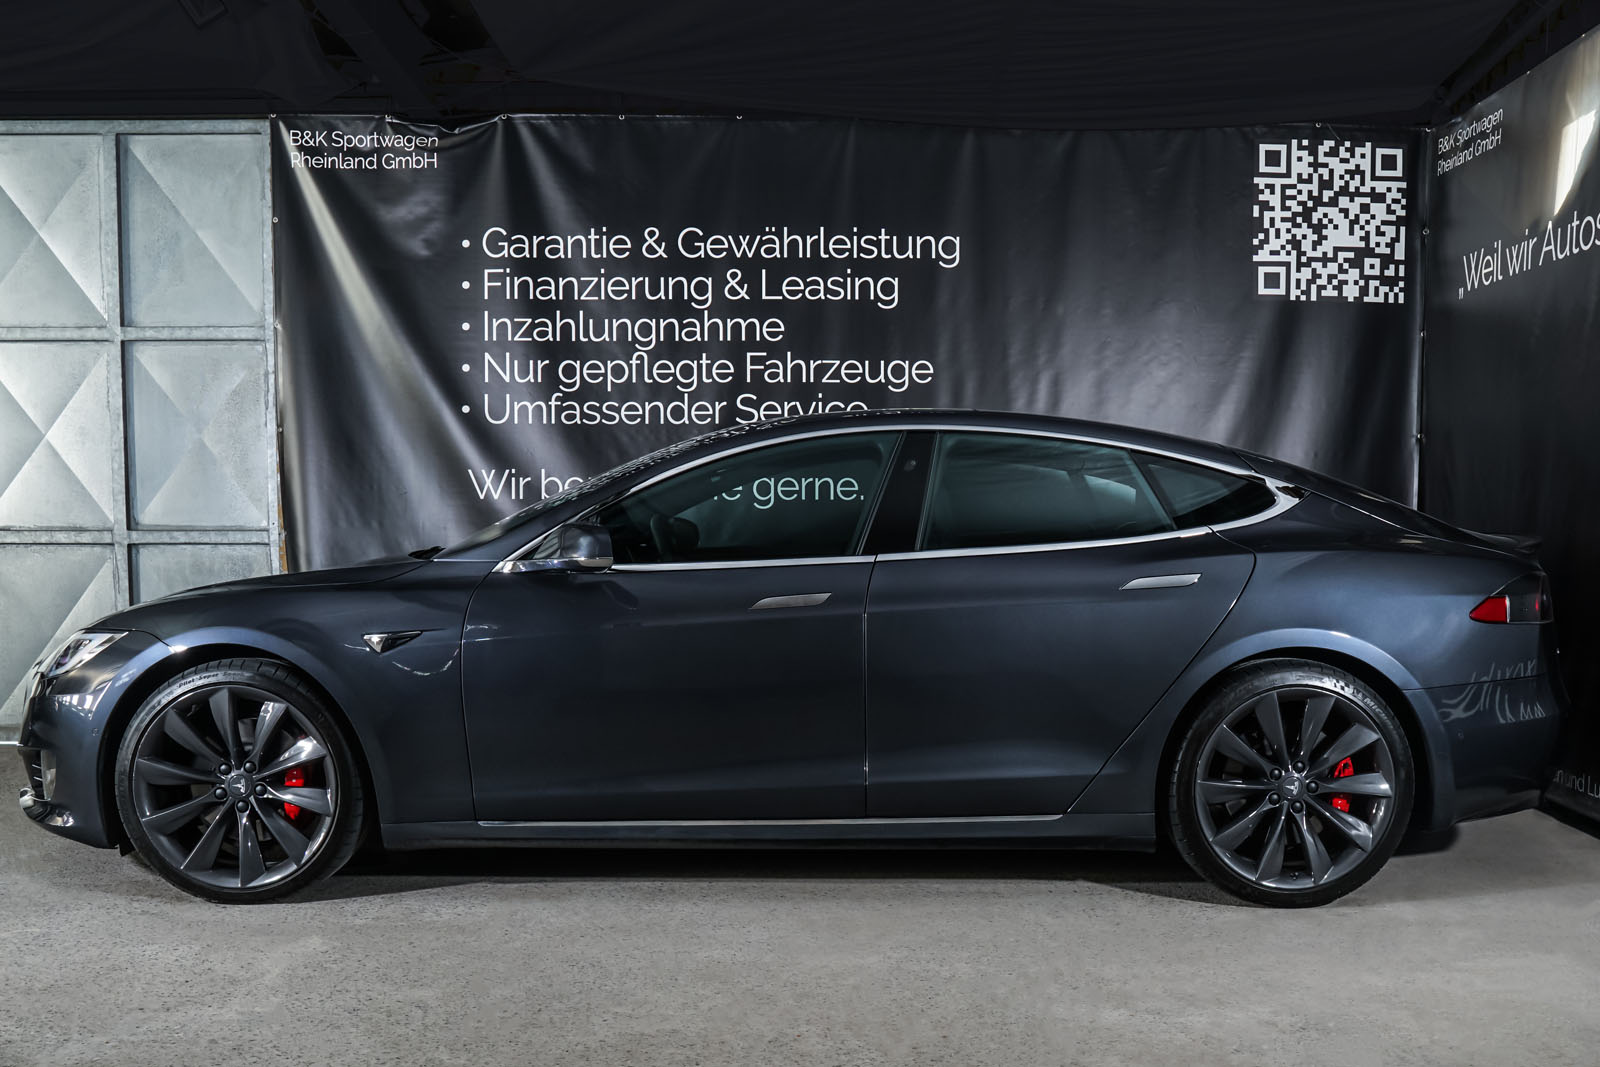 Tesla_ModelS_P100D_MidnightSilver_Black_TES-6539_5_w